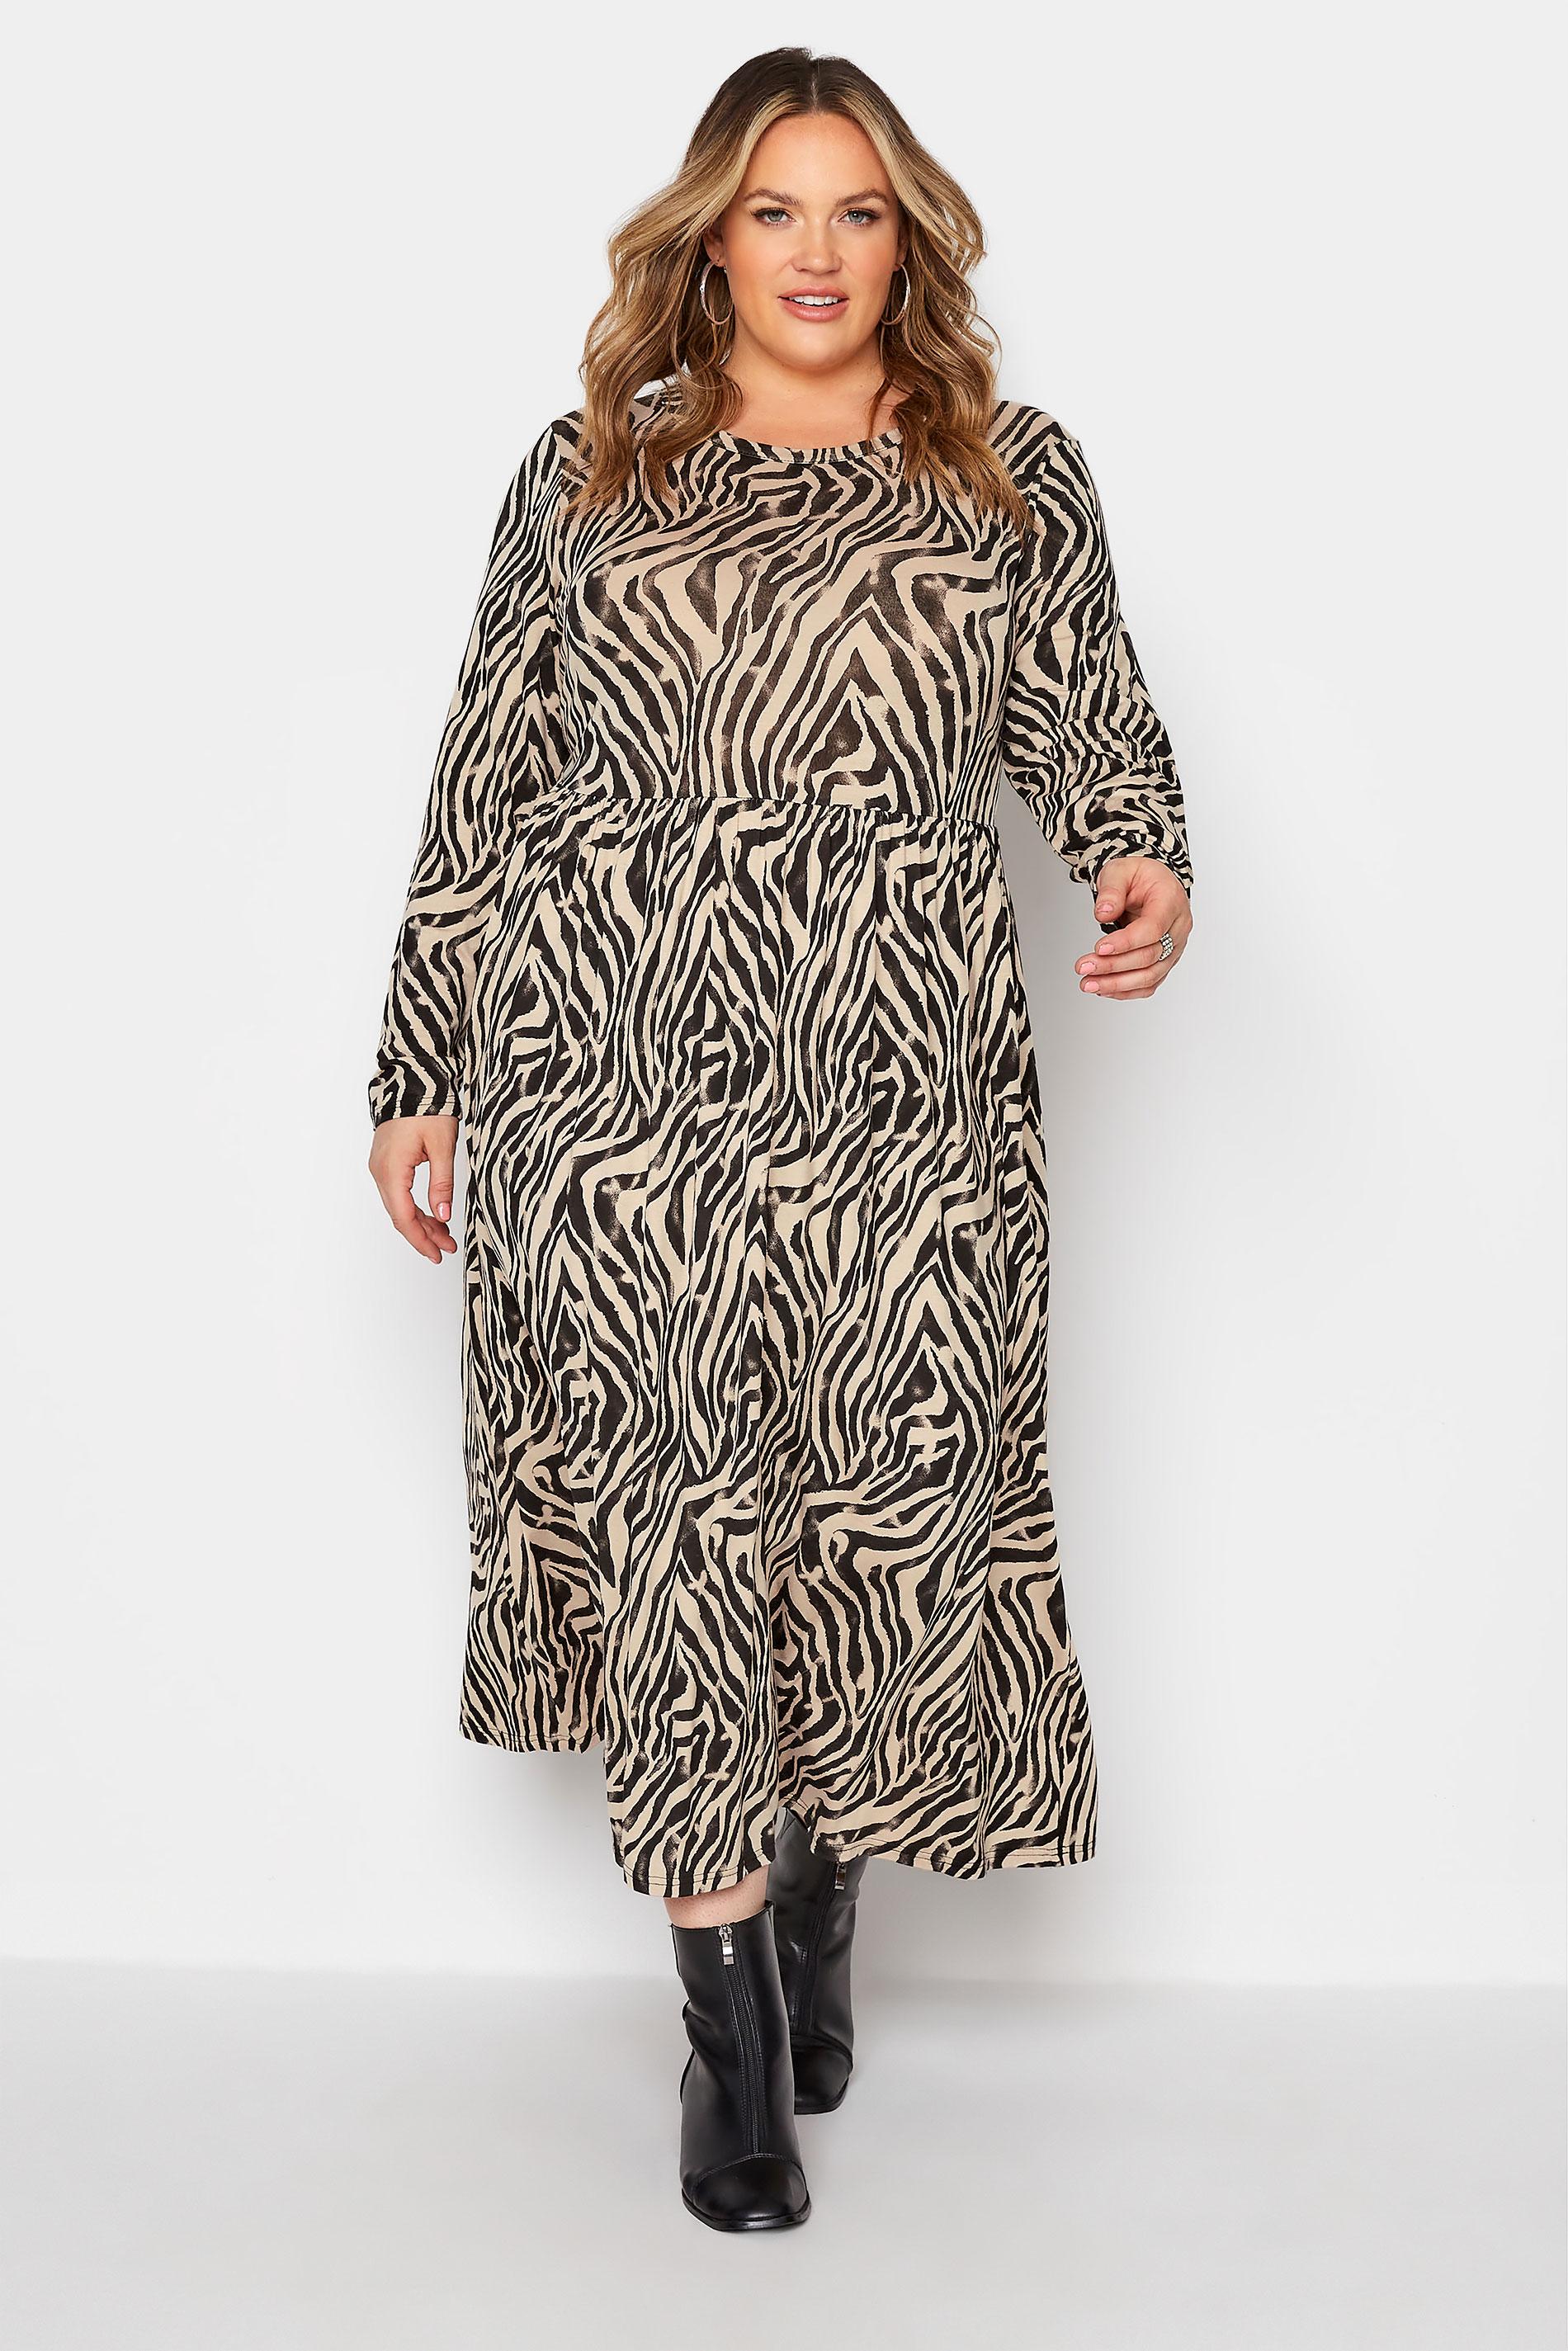 LIMITED COLLECTION Beige Zebra Print Smock Midaxi Dress_A.jpg